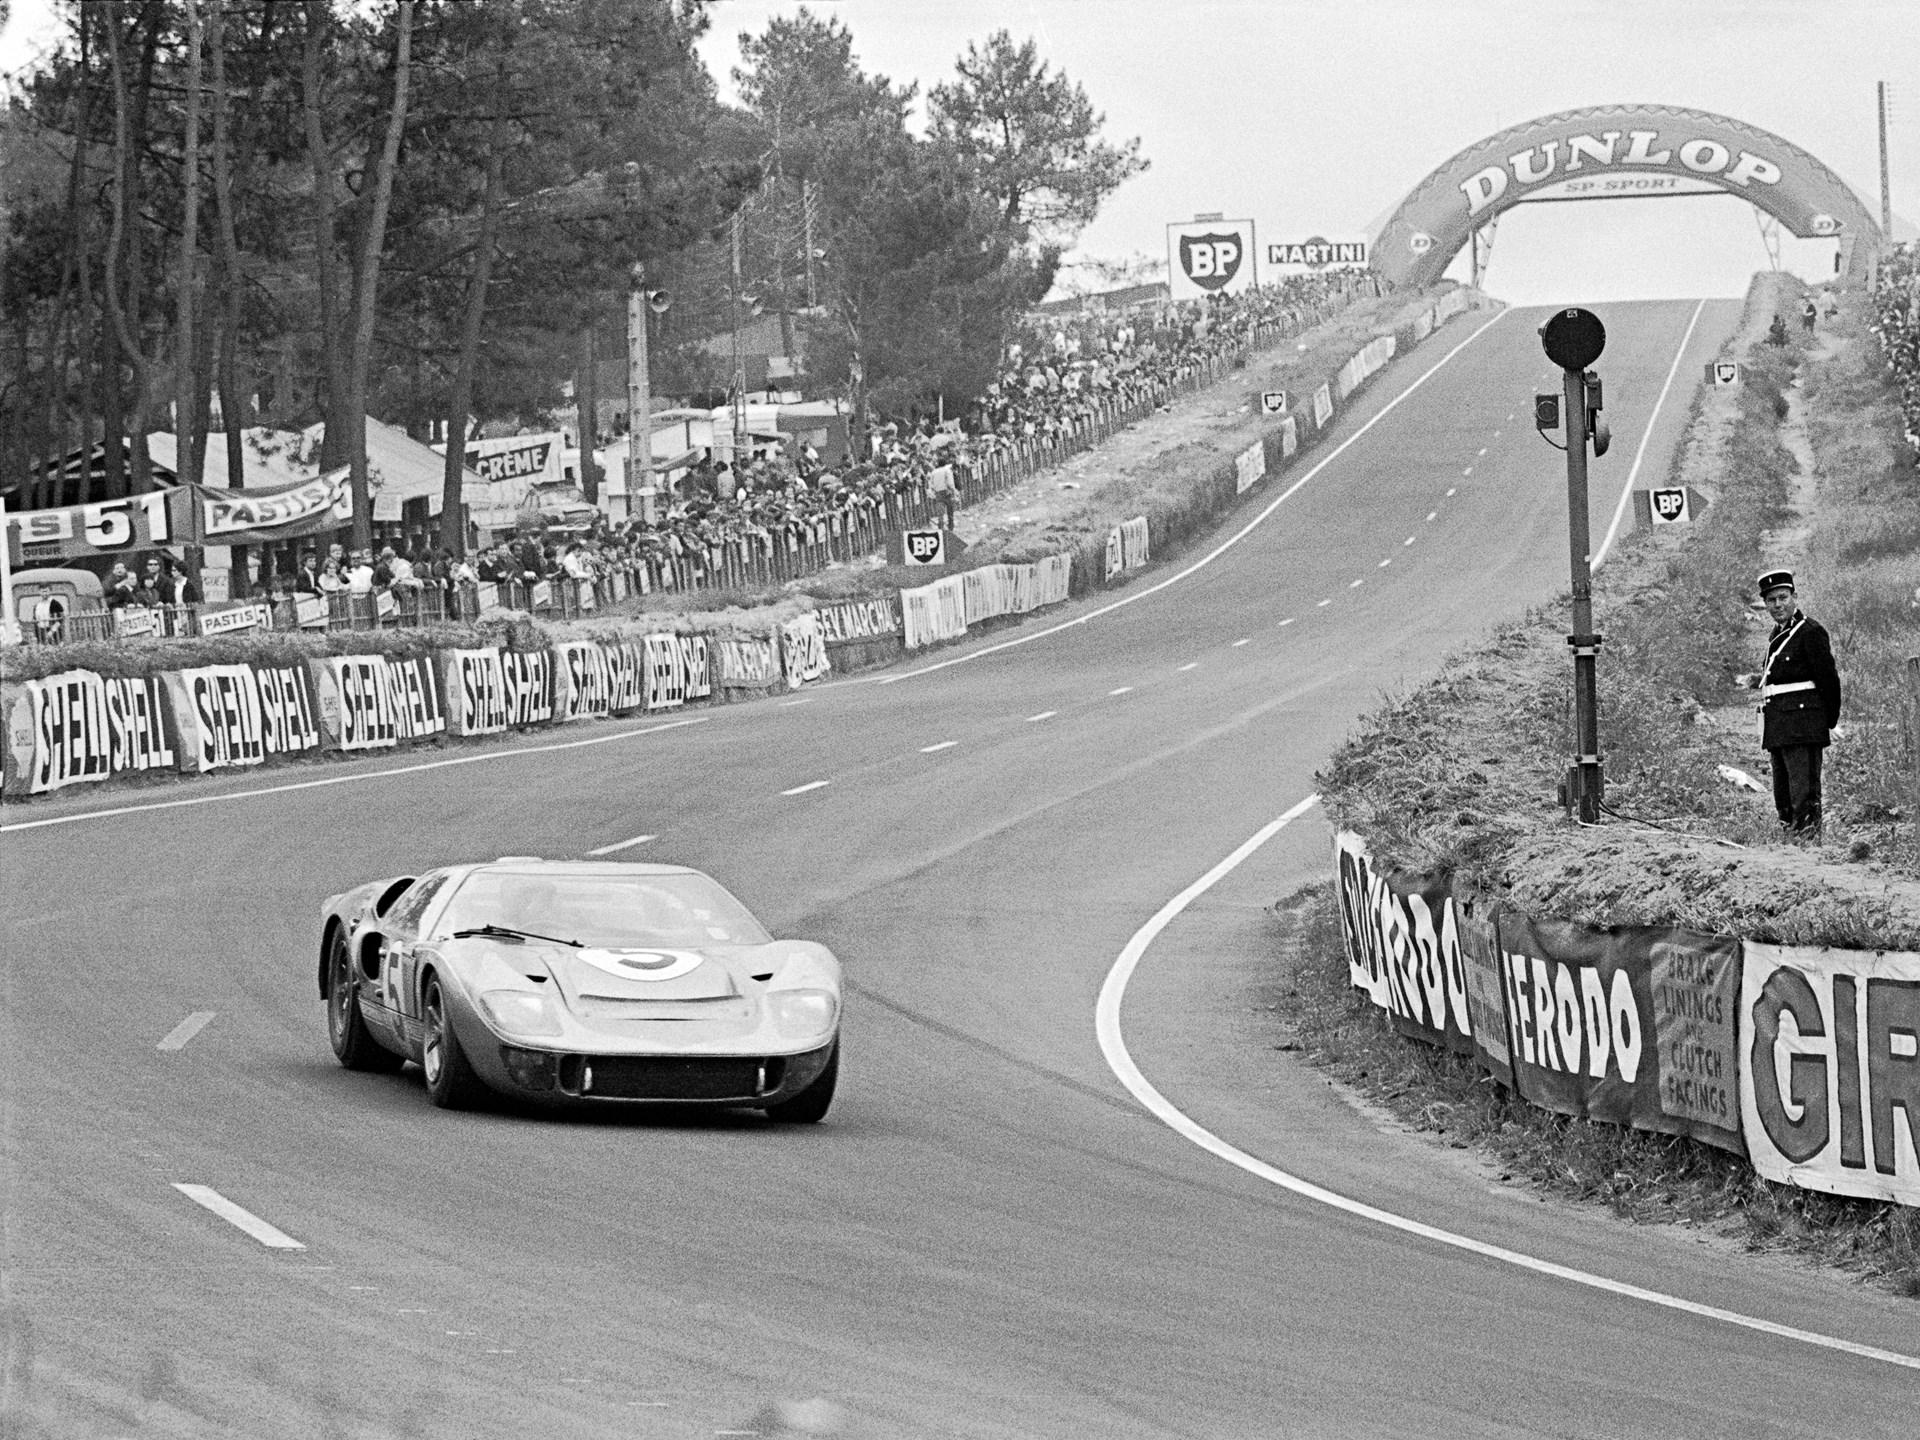 Ronnie Bucknum/Dick Hutcherson, 1966 Le Mans 24 Hours, 3rd Overall.